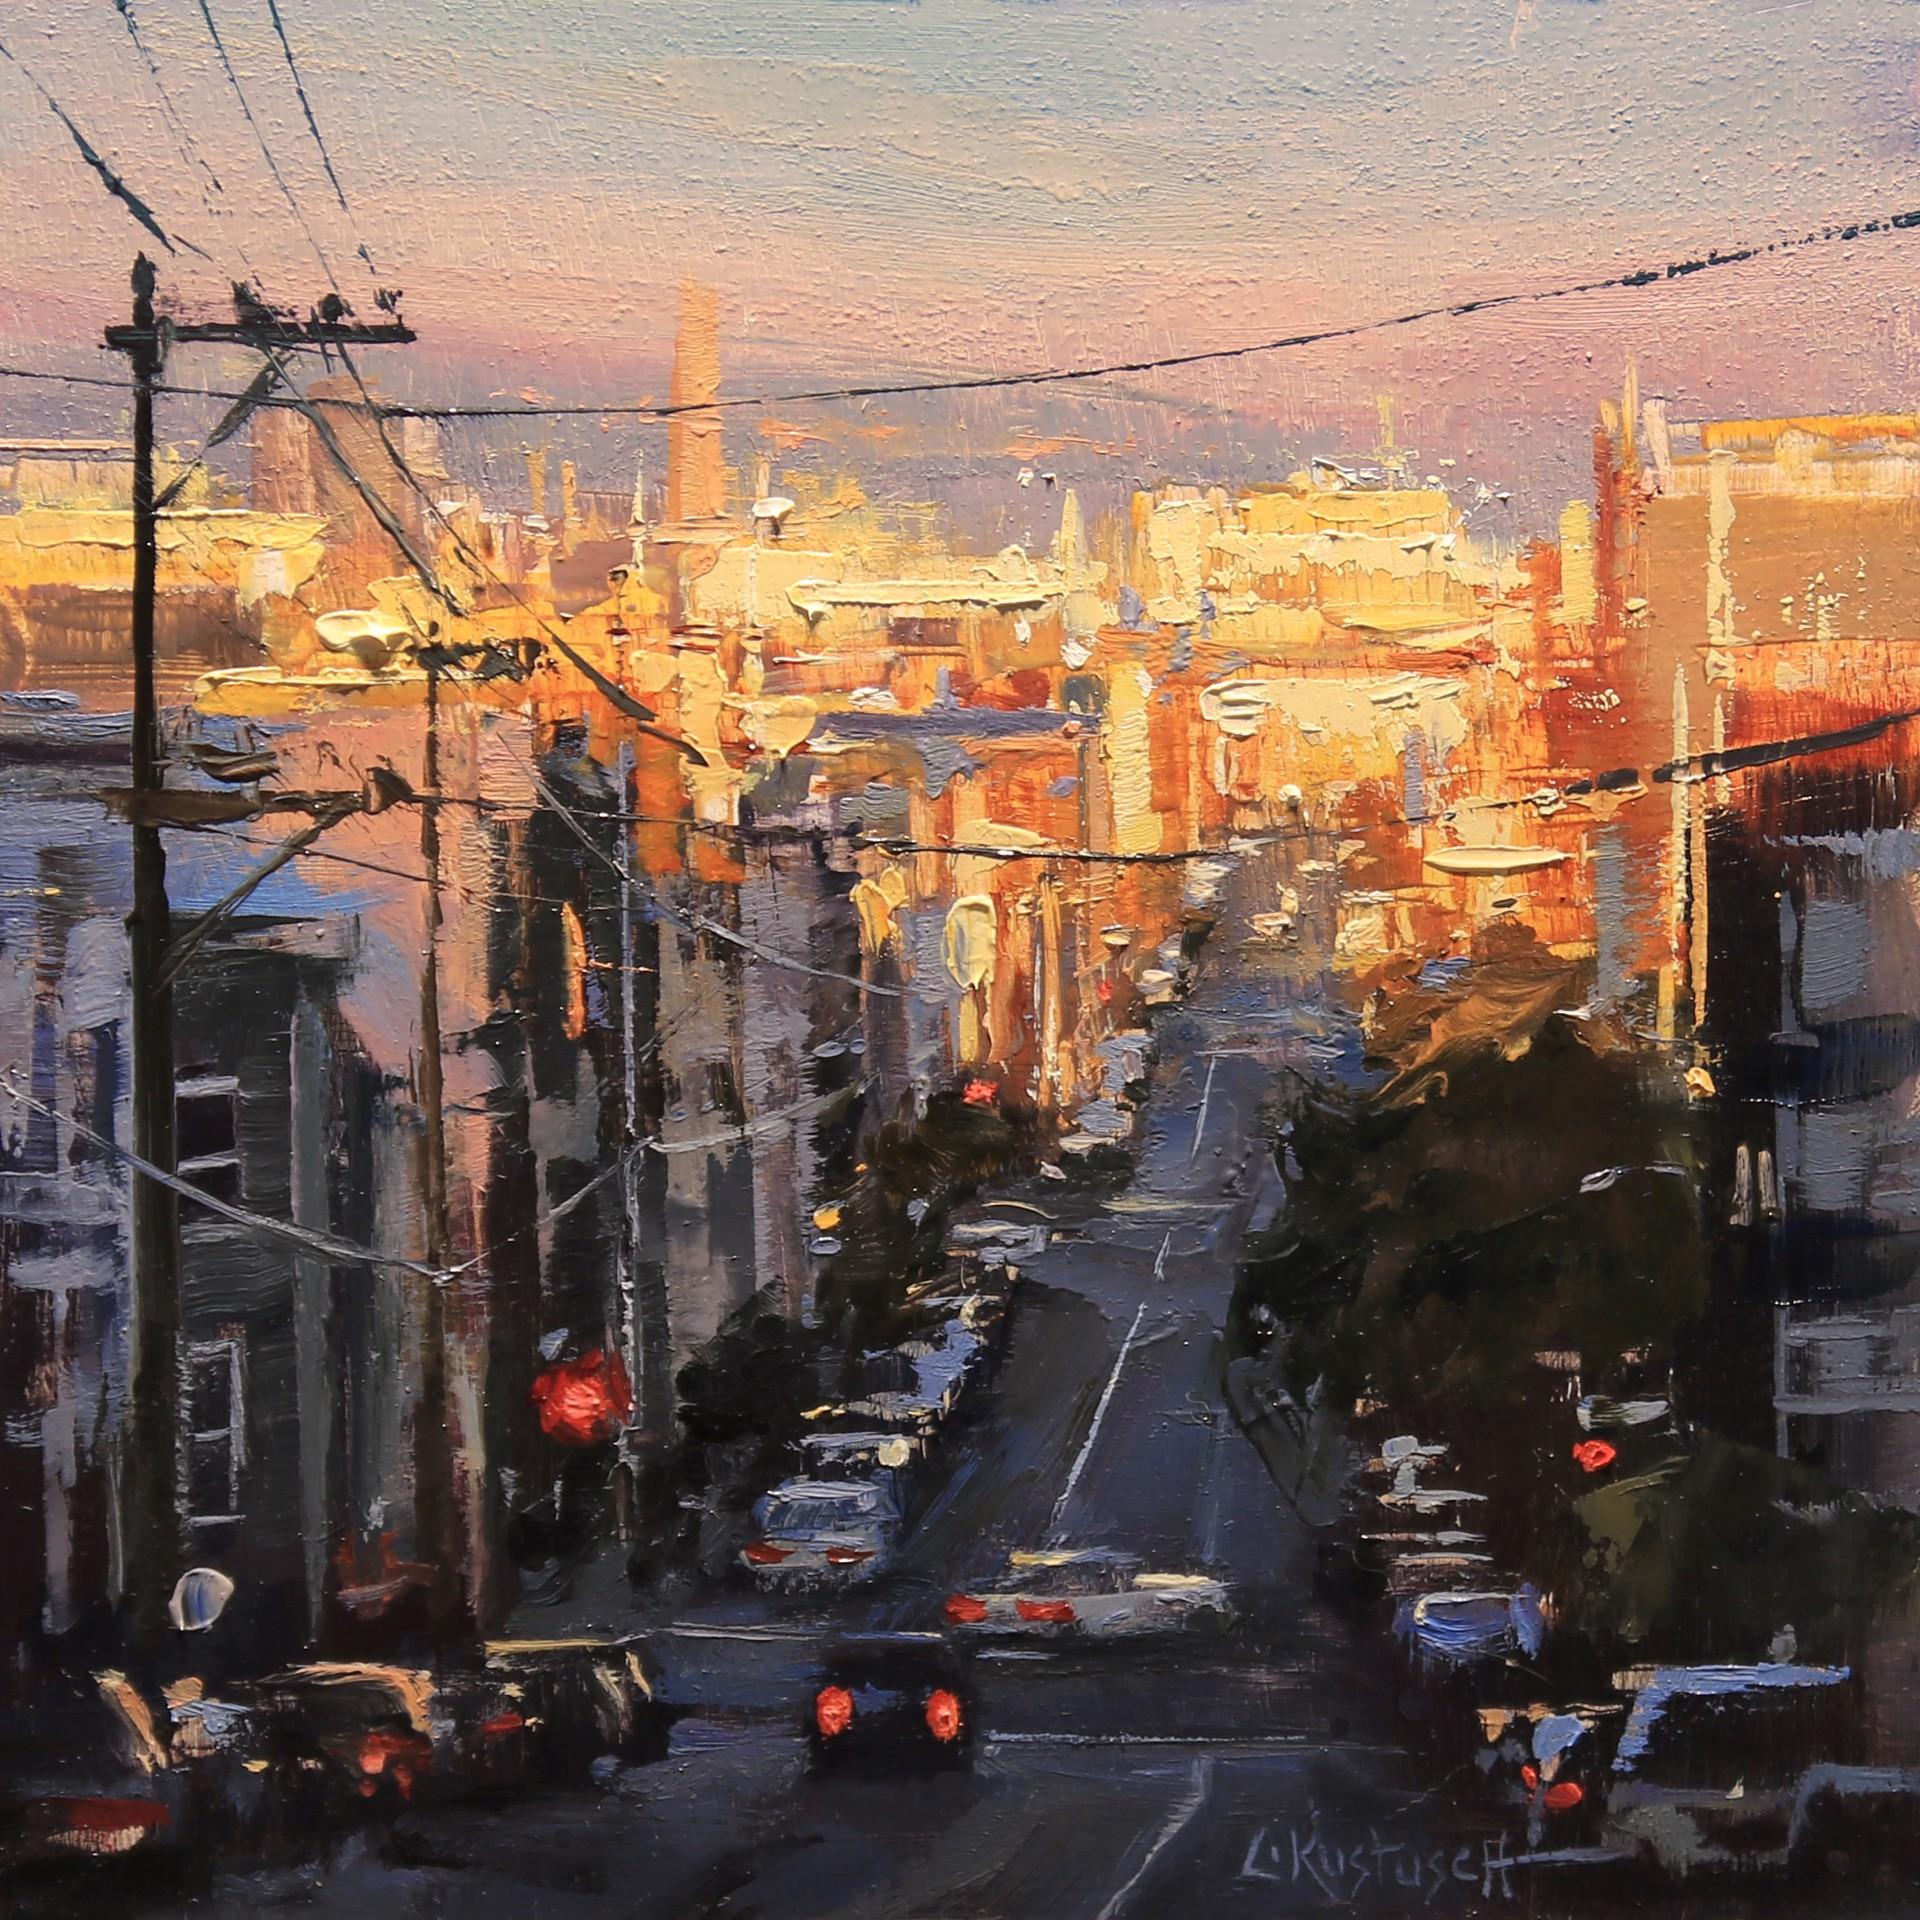 Following the Sun by Lindsey Kustusch